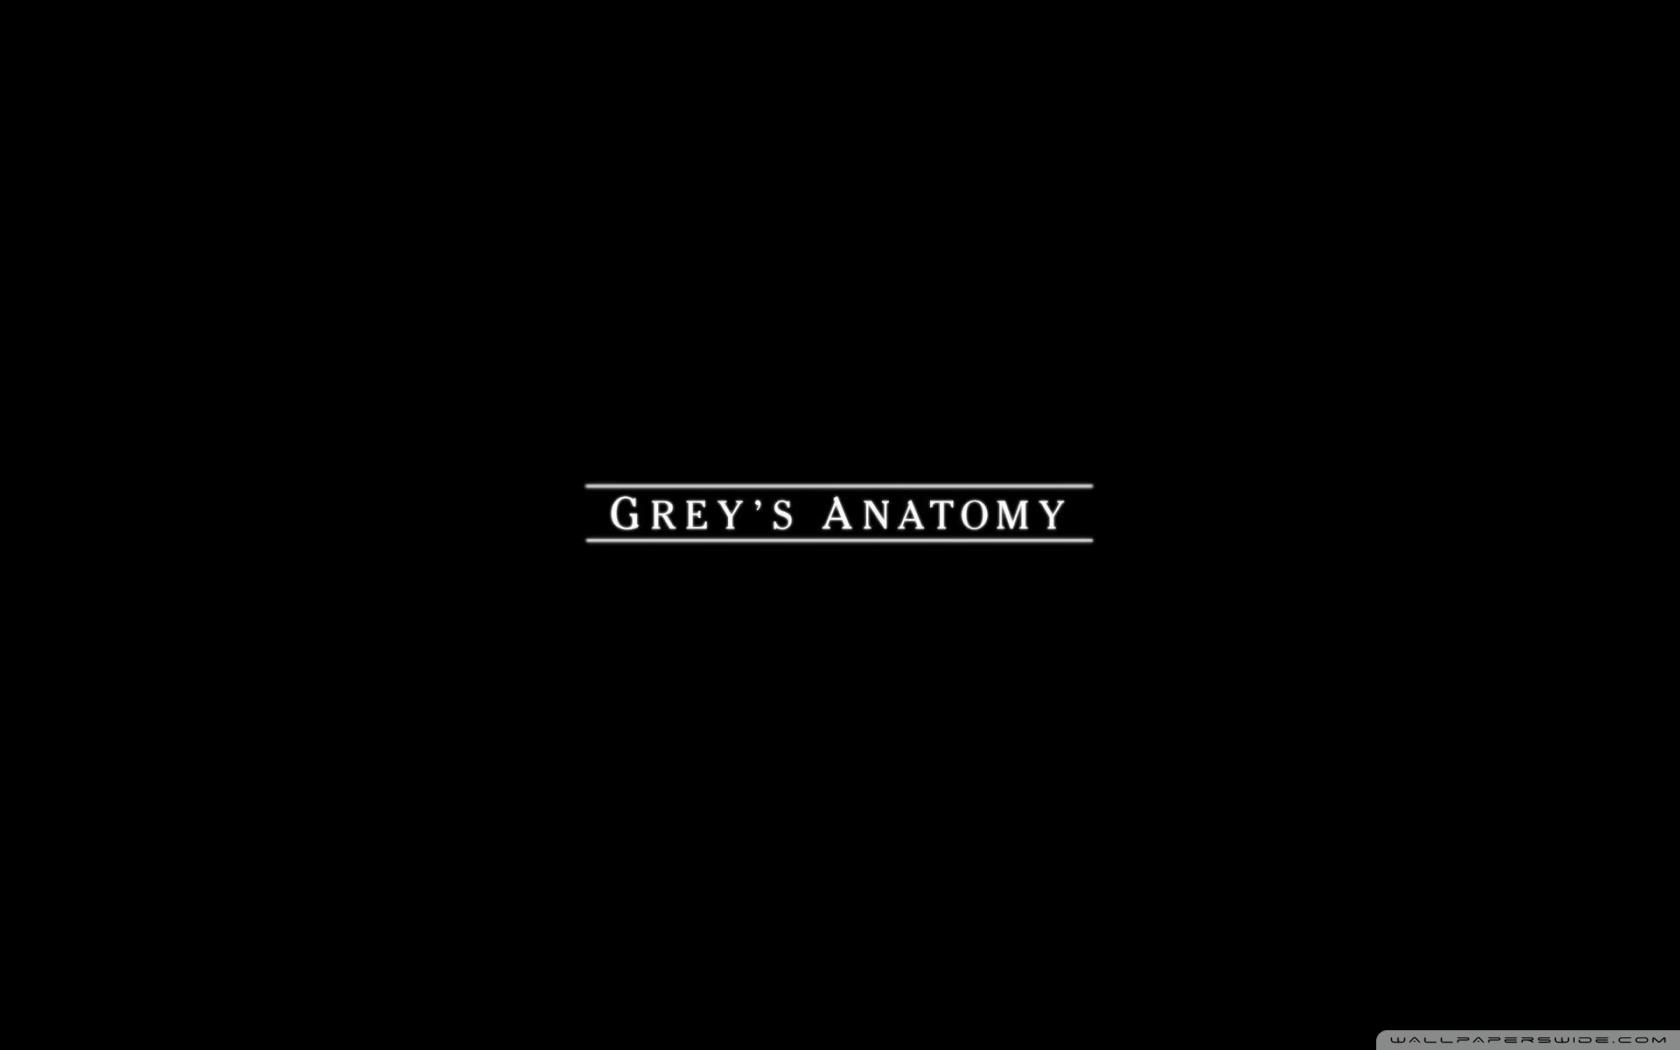 Greys Anatomy Quotes Wallpapers Grey S Anatomy 4k Hd Desktop Wallpaper For 4k Ultra Hd Tv